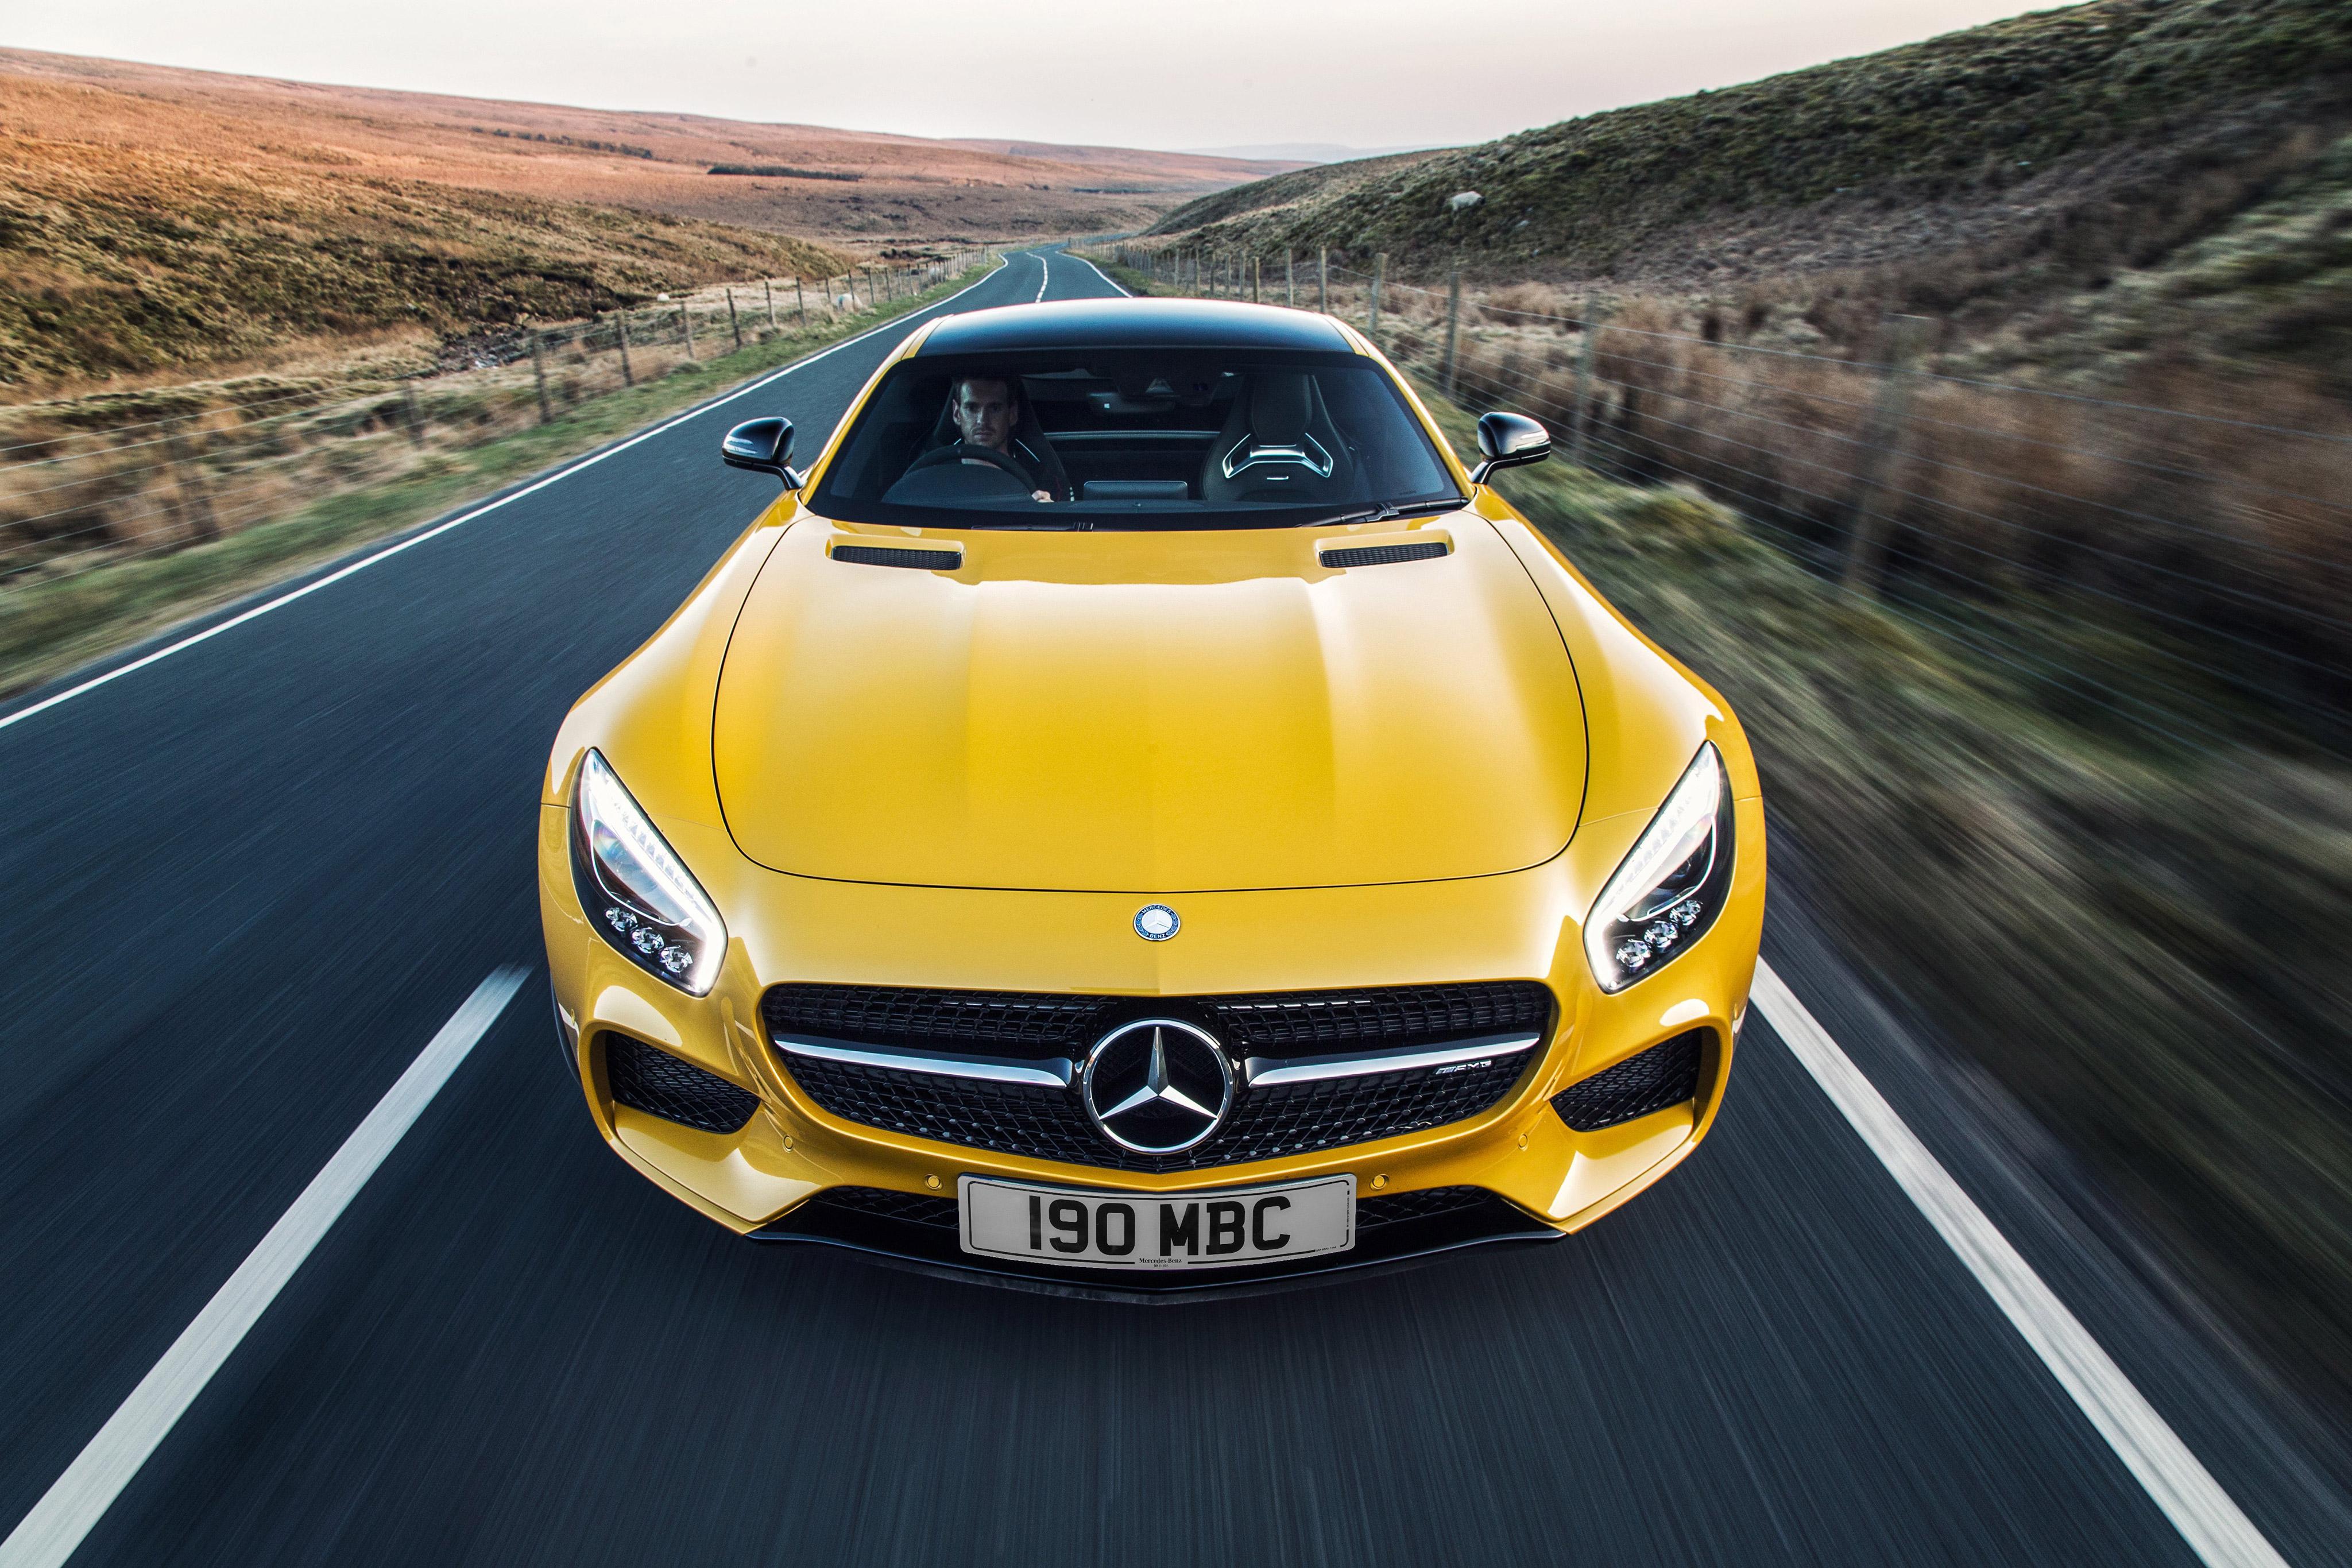 Mercedes Amg Gt Wallpaper: Mercedes Amg GT 2017, HD Cars, 4k Wallpapers, Images